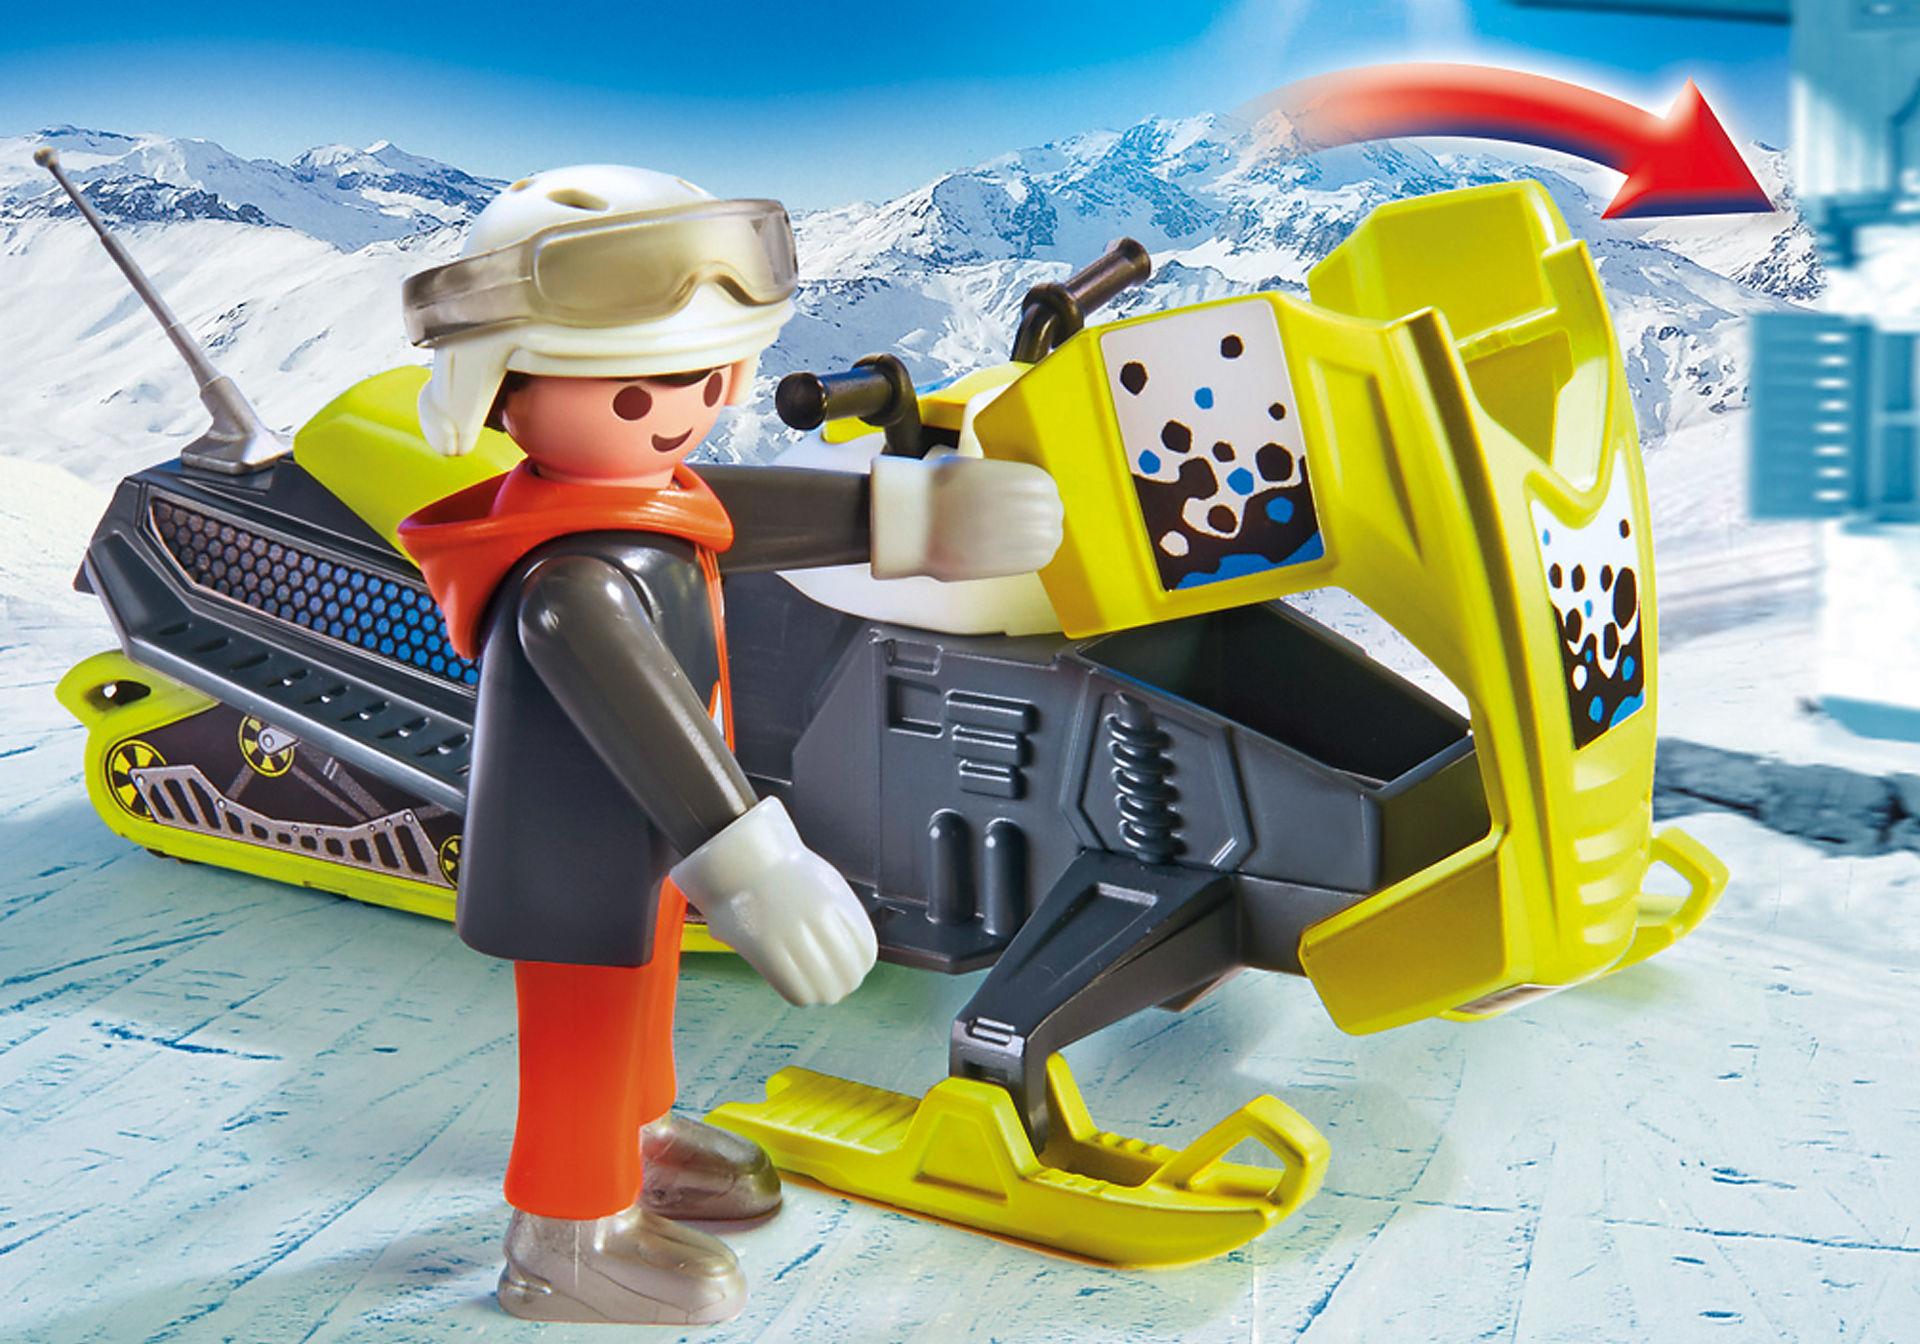 9285 Sneeuwscooter zoom image5